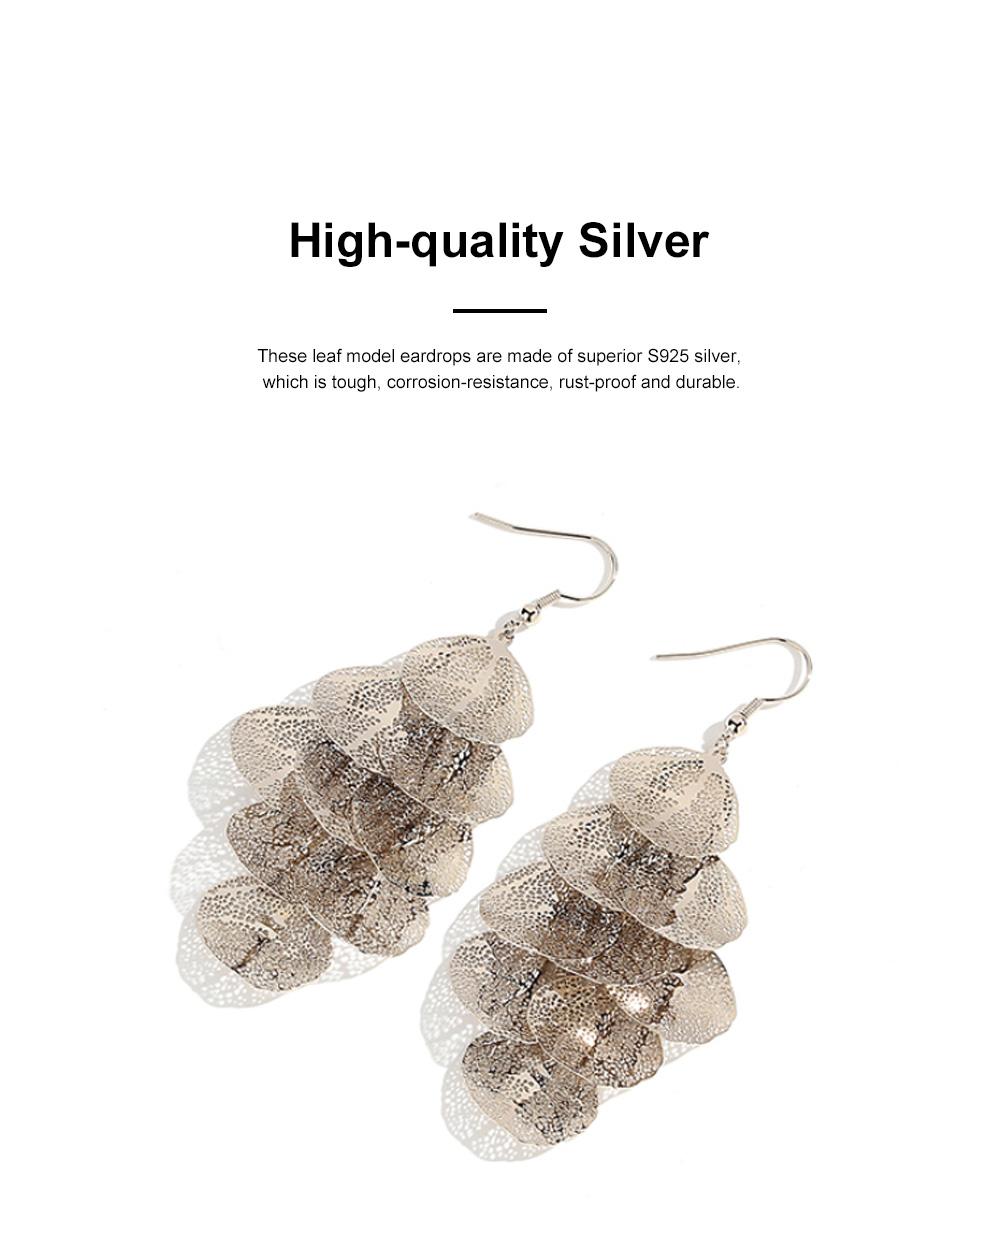 CAROMAY Stylish Elegant Vintage Delicate Hollow Leaf Model Tassels Silver Eardrops Earrings with Mirror Polishing Electroplating 1